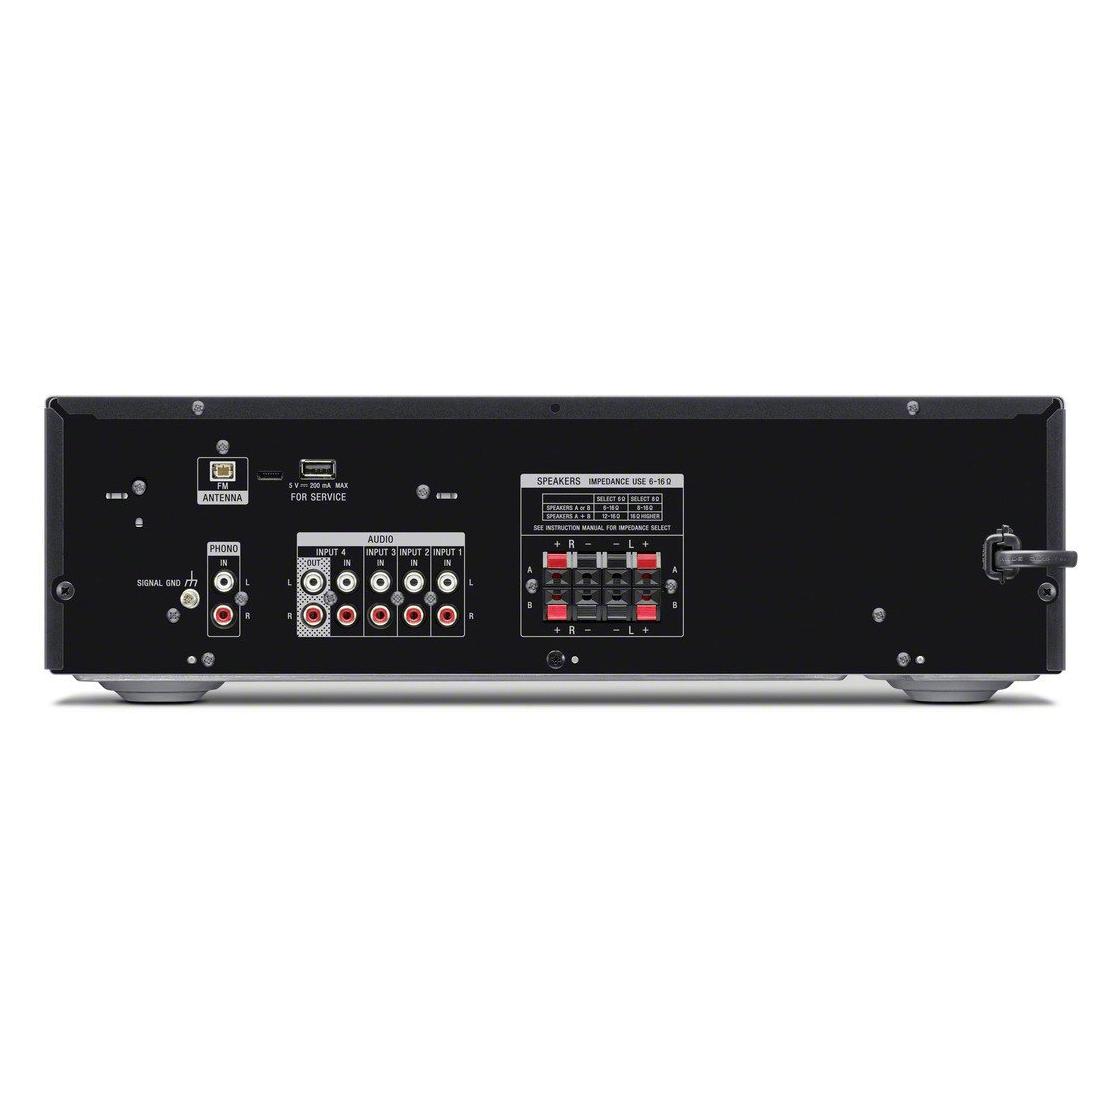 Sony Str Dh190 Stereo Receiver W Phono Amp Bluetooth